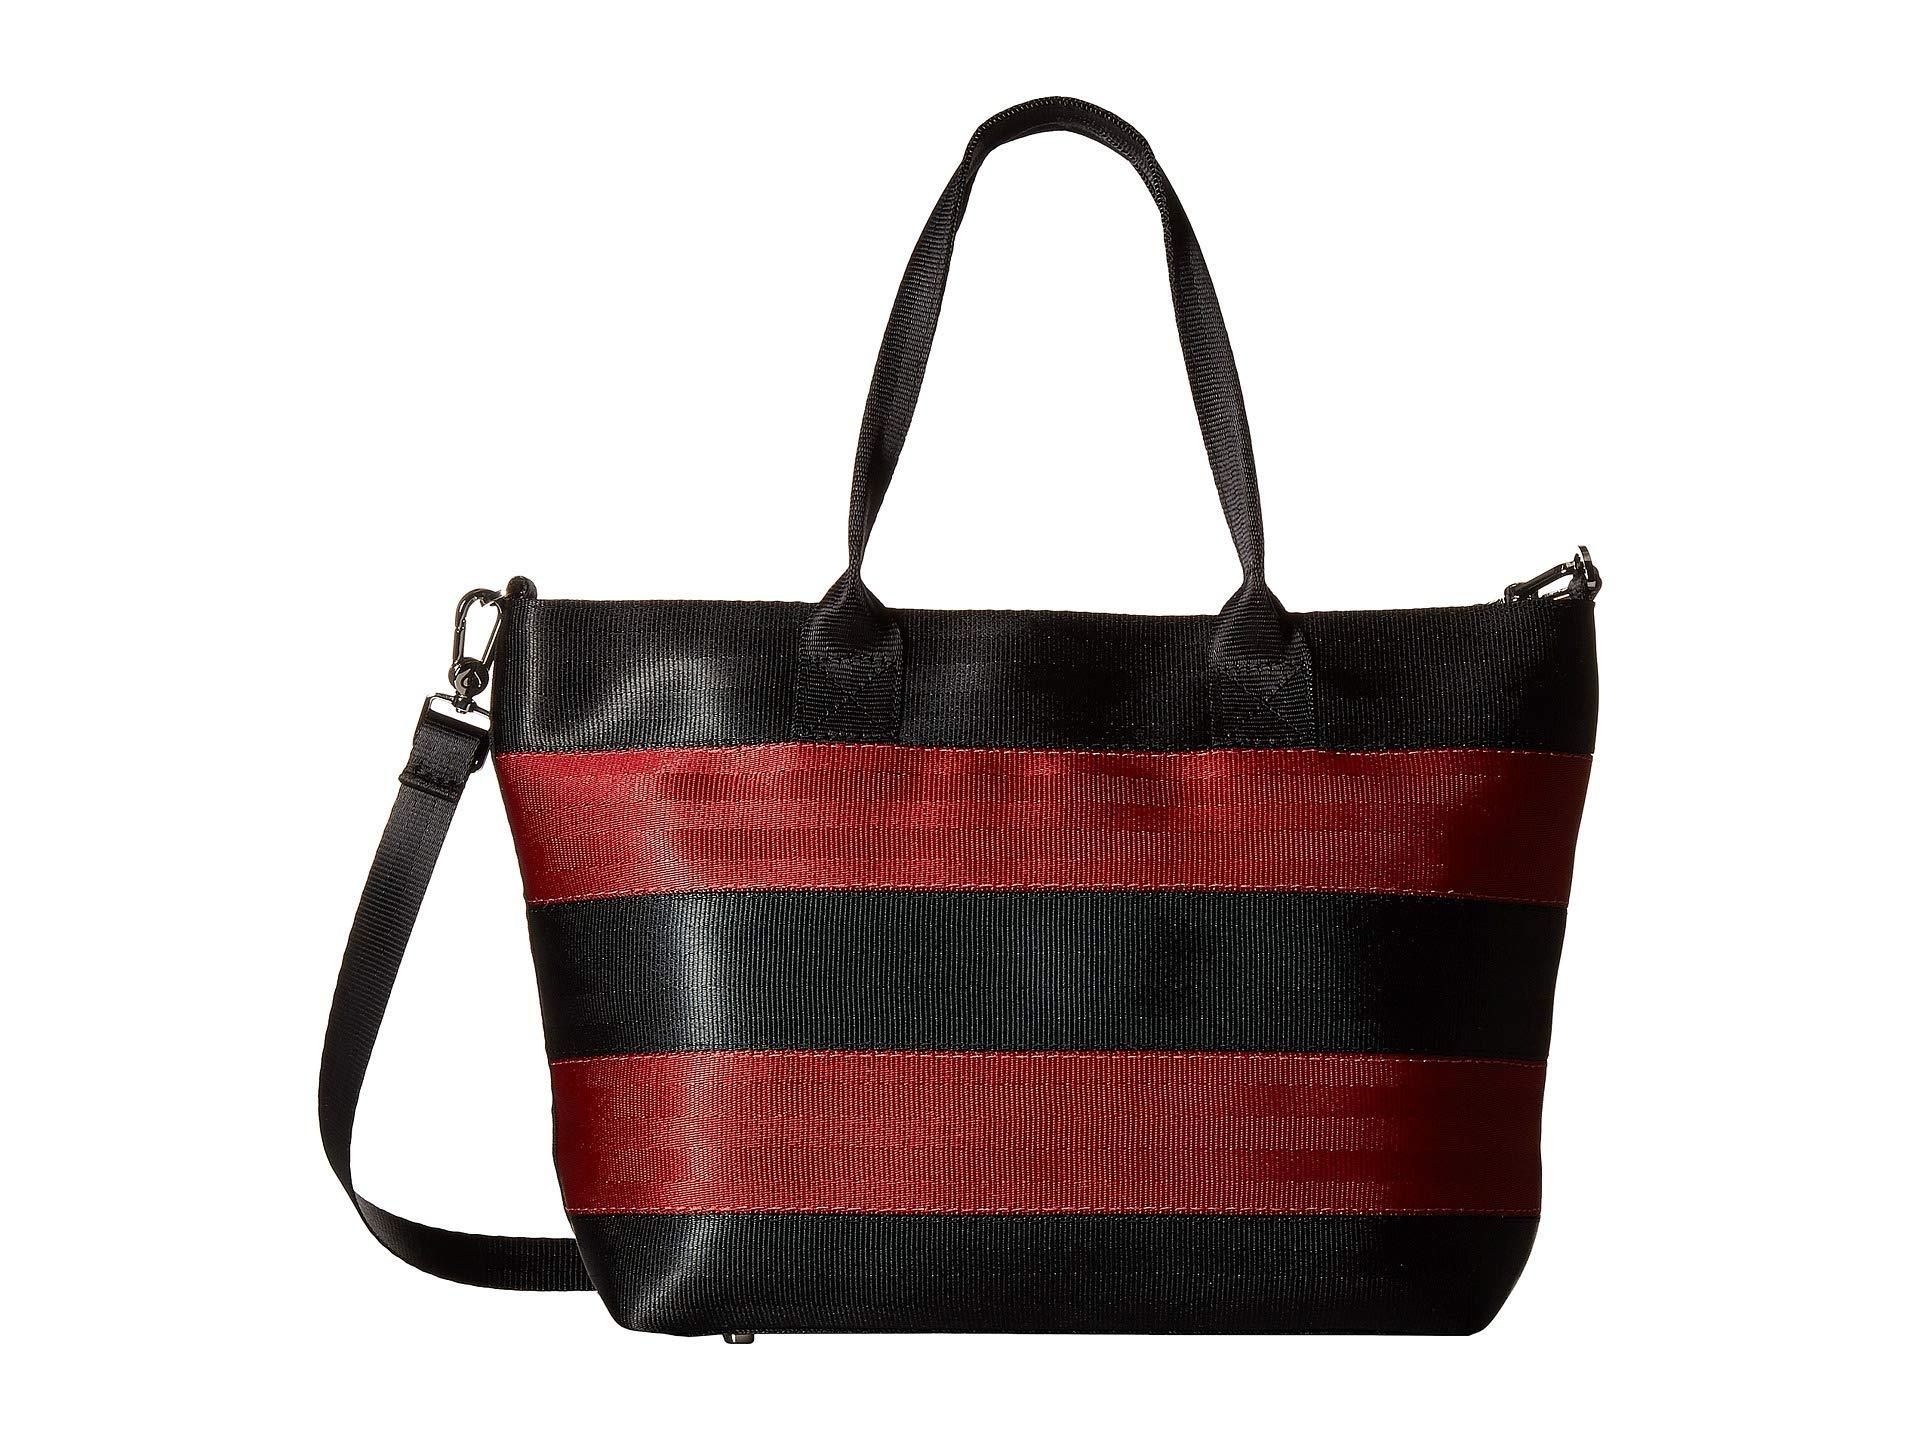 Seatbelt Red Mini Streamline Bag Tote Harveys Dragon 7F4TCC